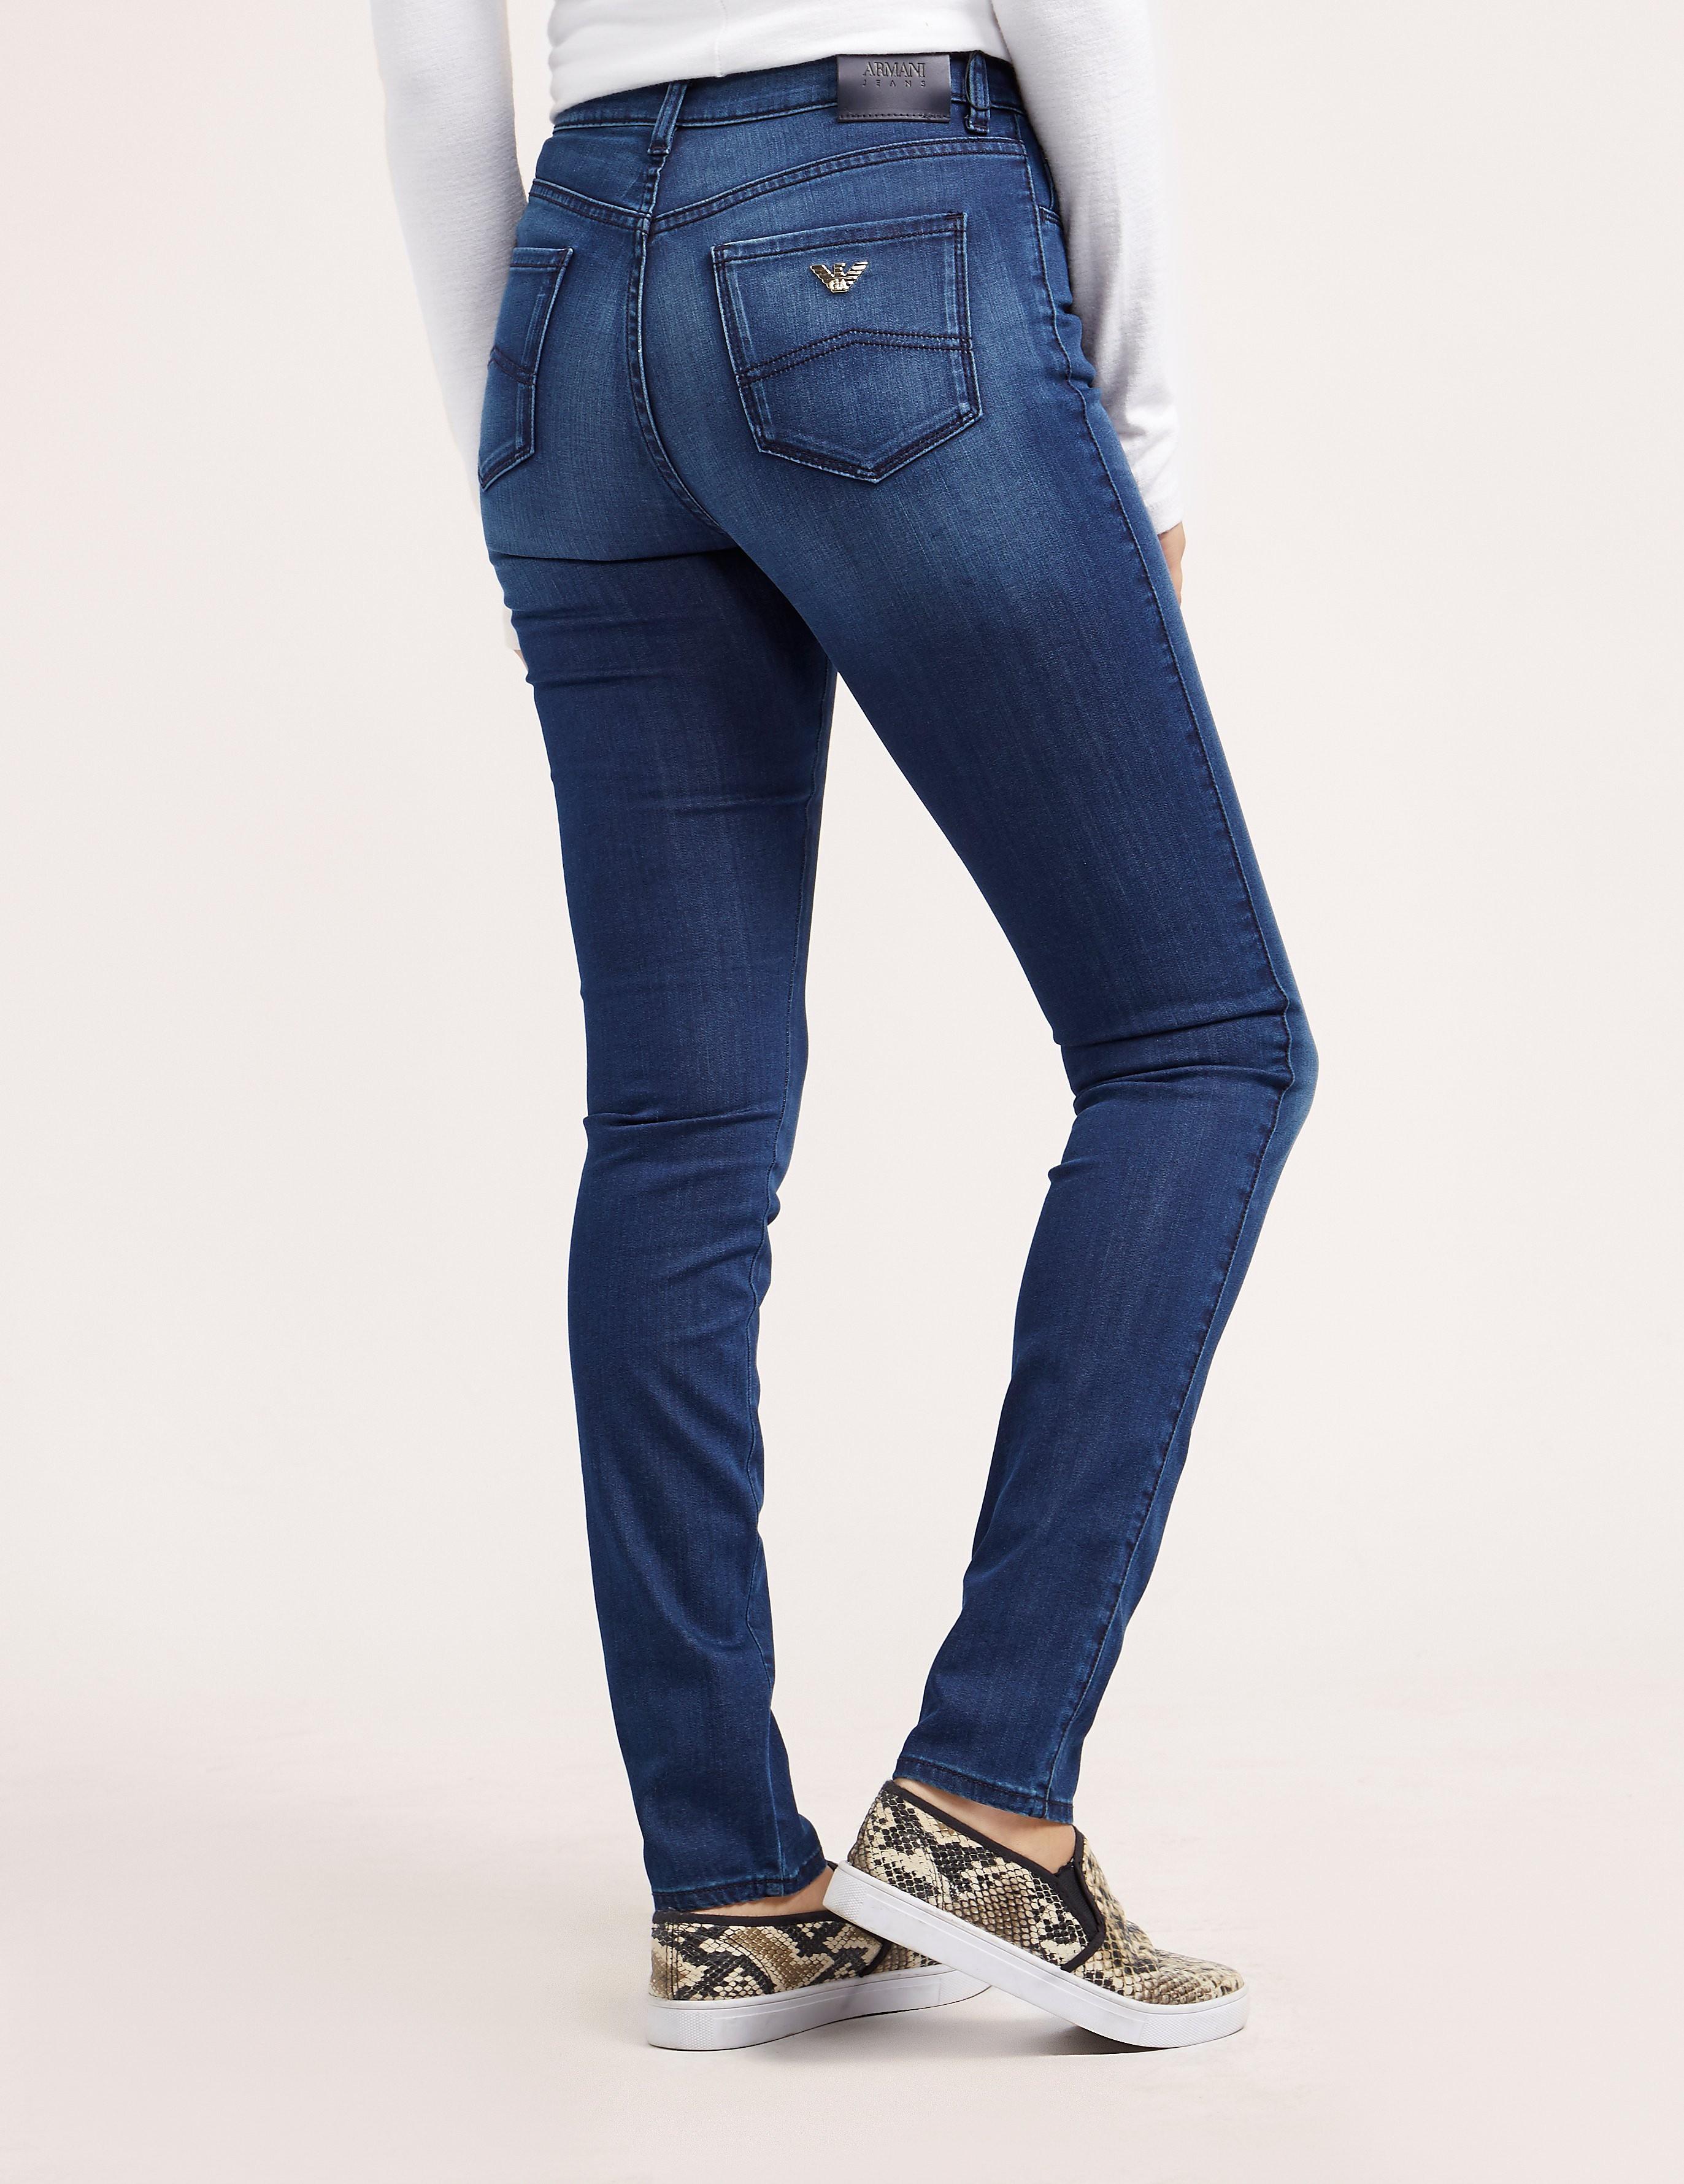 Armani Jeans J20 High Waist Jean